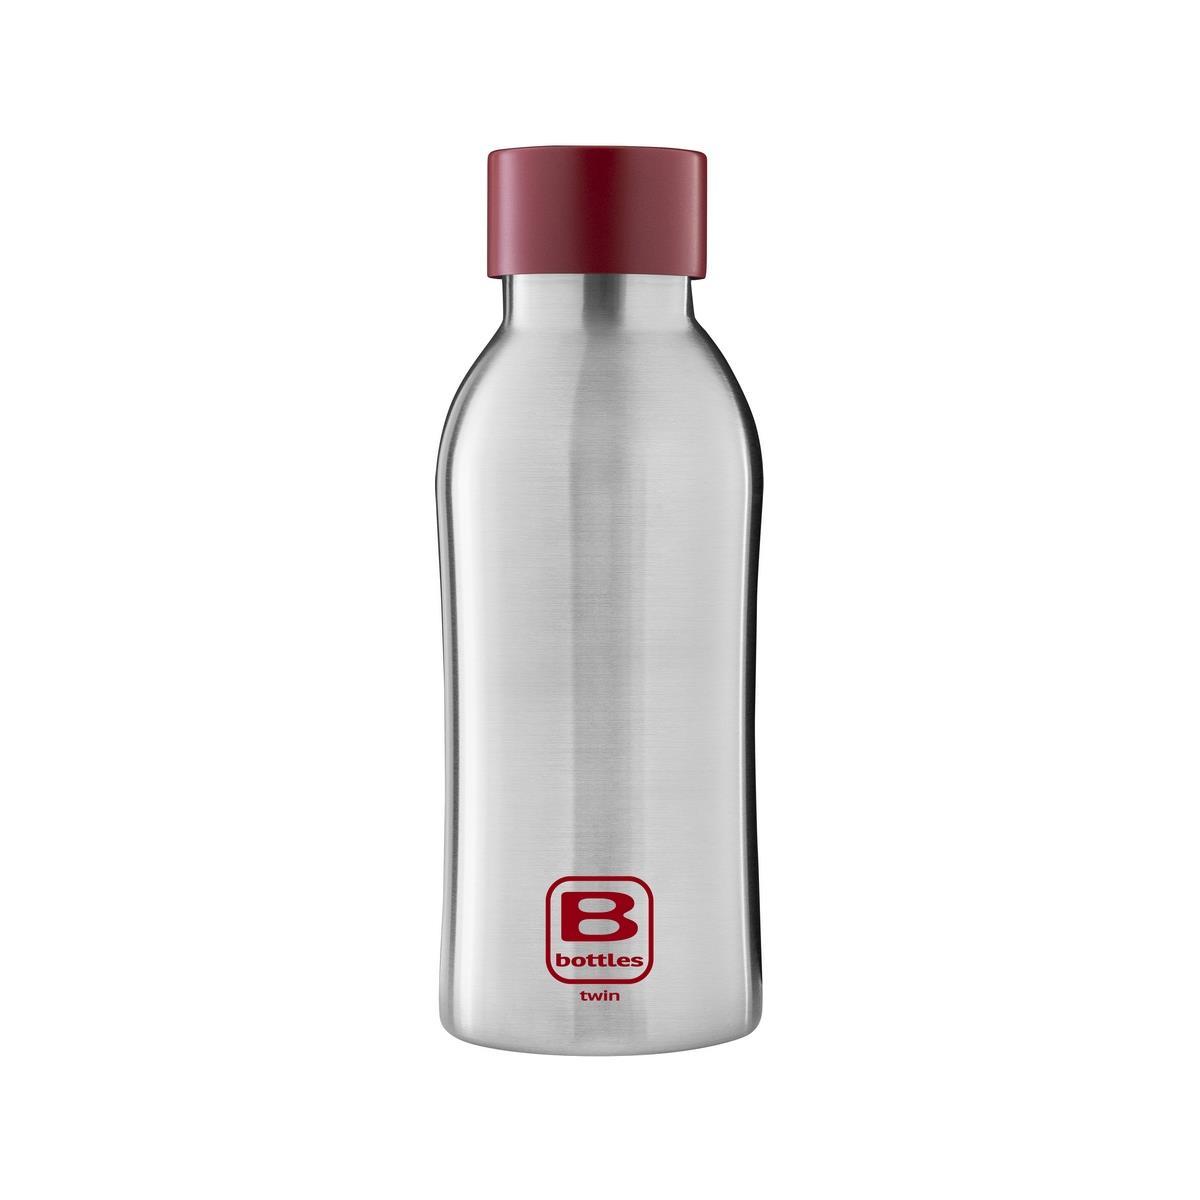 B Bottles Twin - Steel & Red - 350 ml - Bottiglia Termica a doppia parete in acciaio inox 18/10